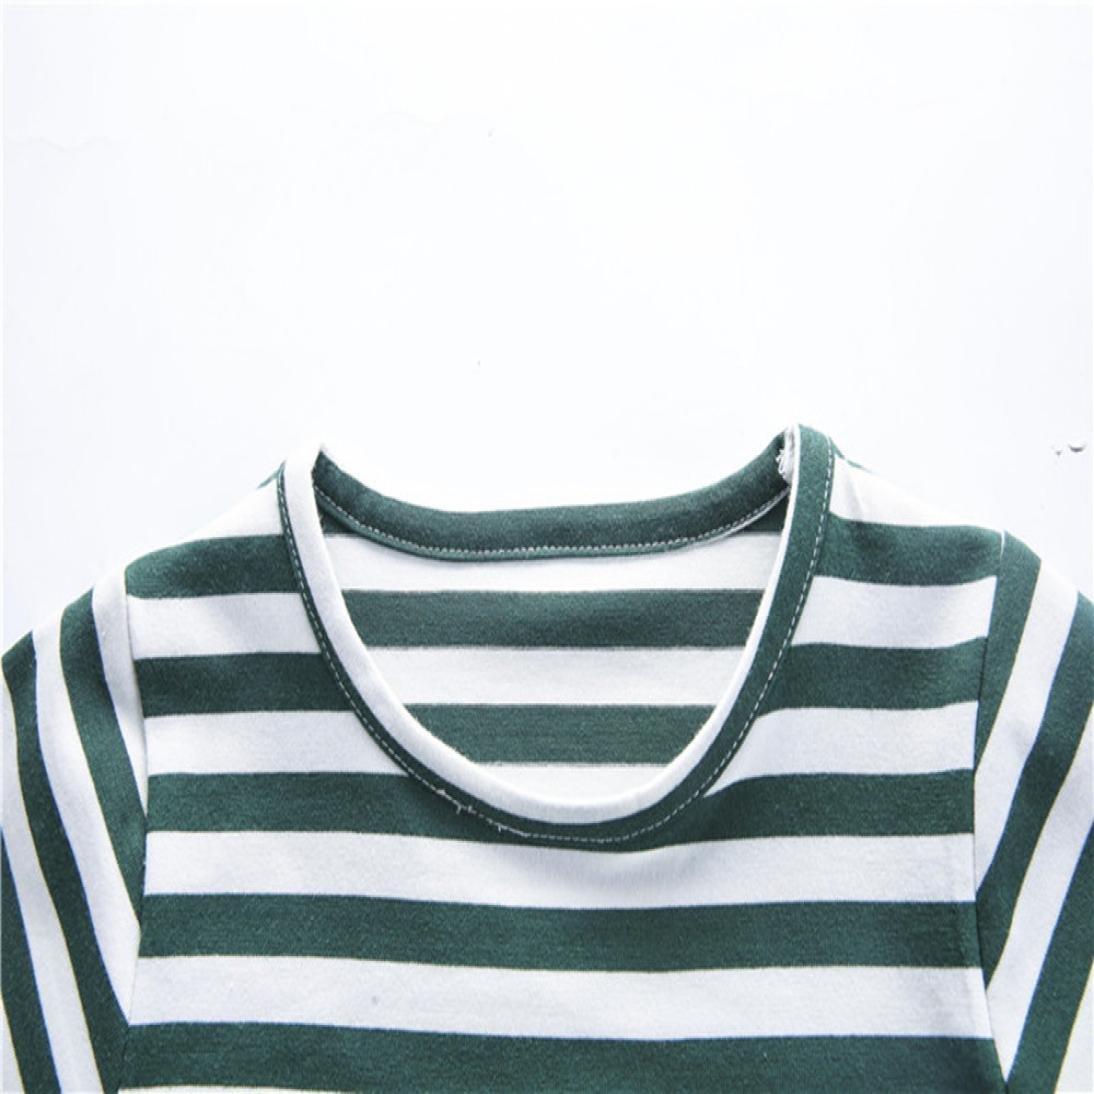 PAOLIAN Conjuntos de Ropa para ni/ños reci/én Nacidos beb/é Verano Camisetas Embroidered de Dinosaurs Pantalones Cortos Impresion de Rayas de 12 Meses 18 Meses 24 Meses 3 a/ños 4 a/ños